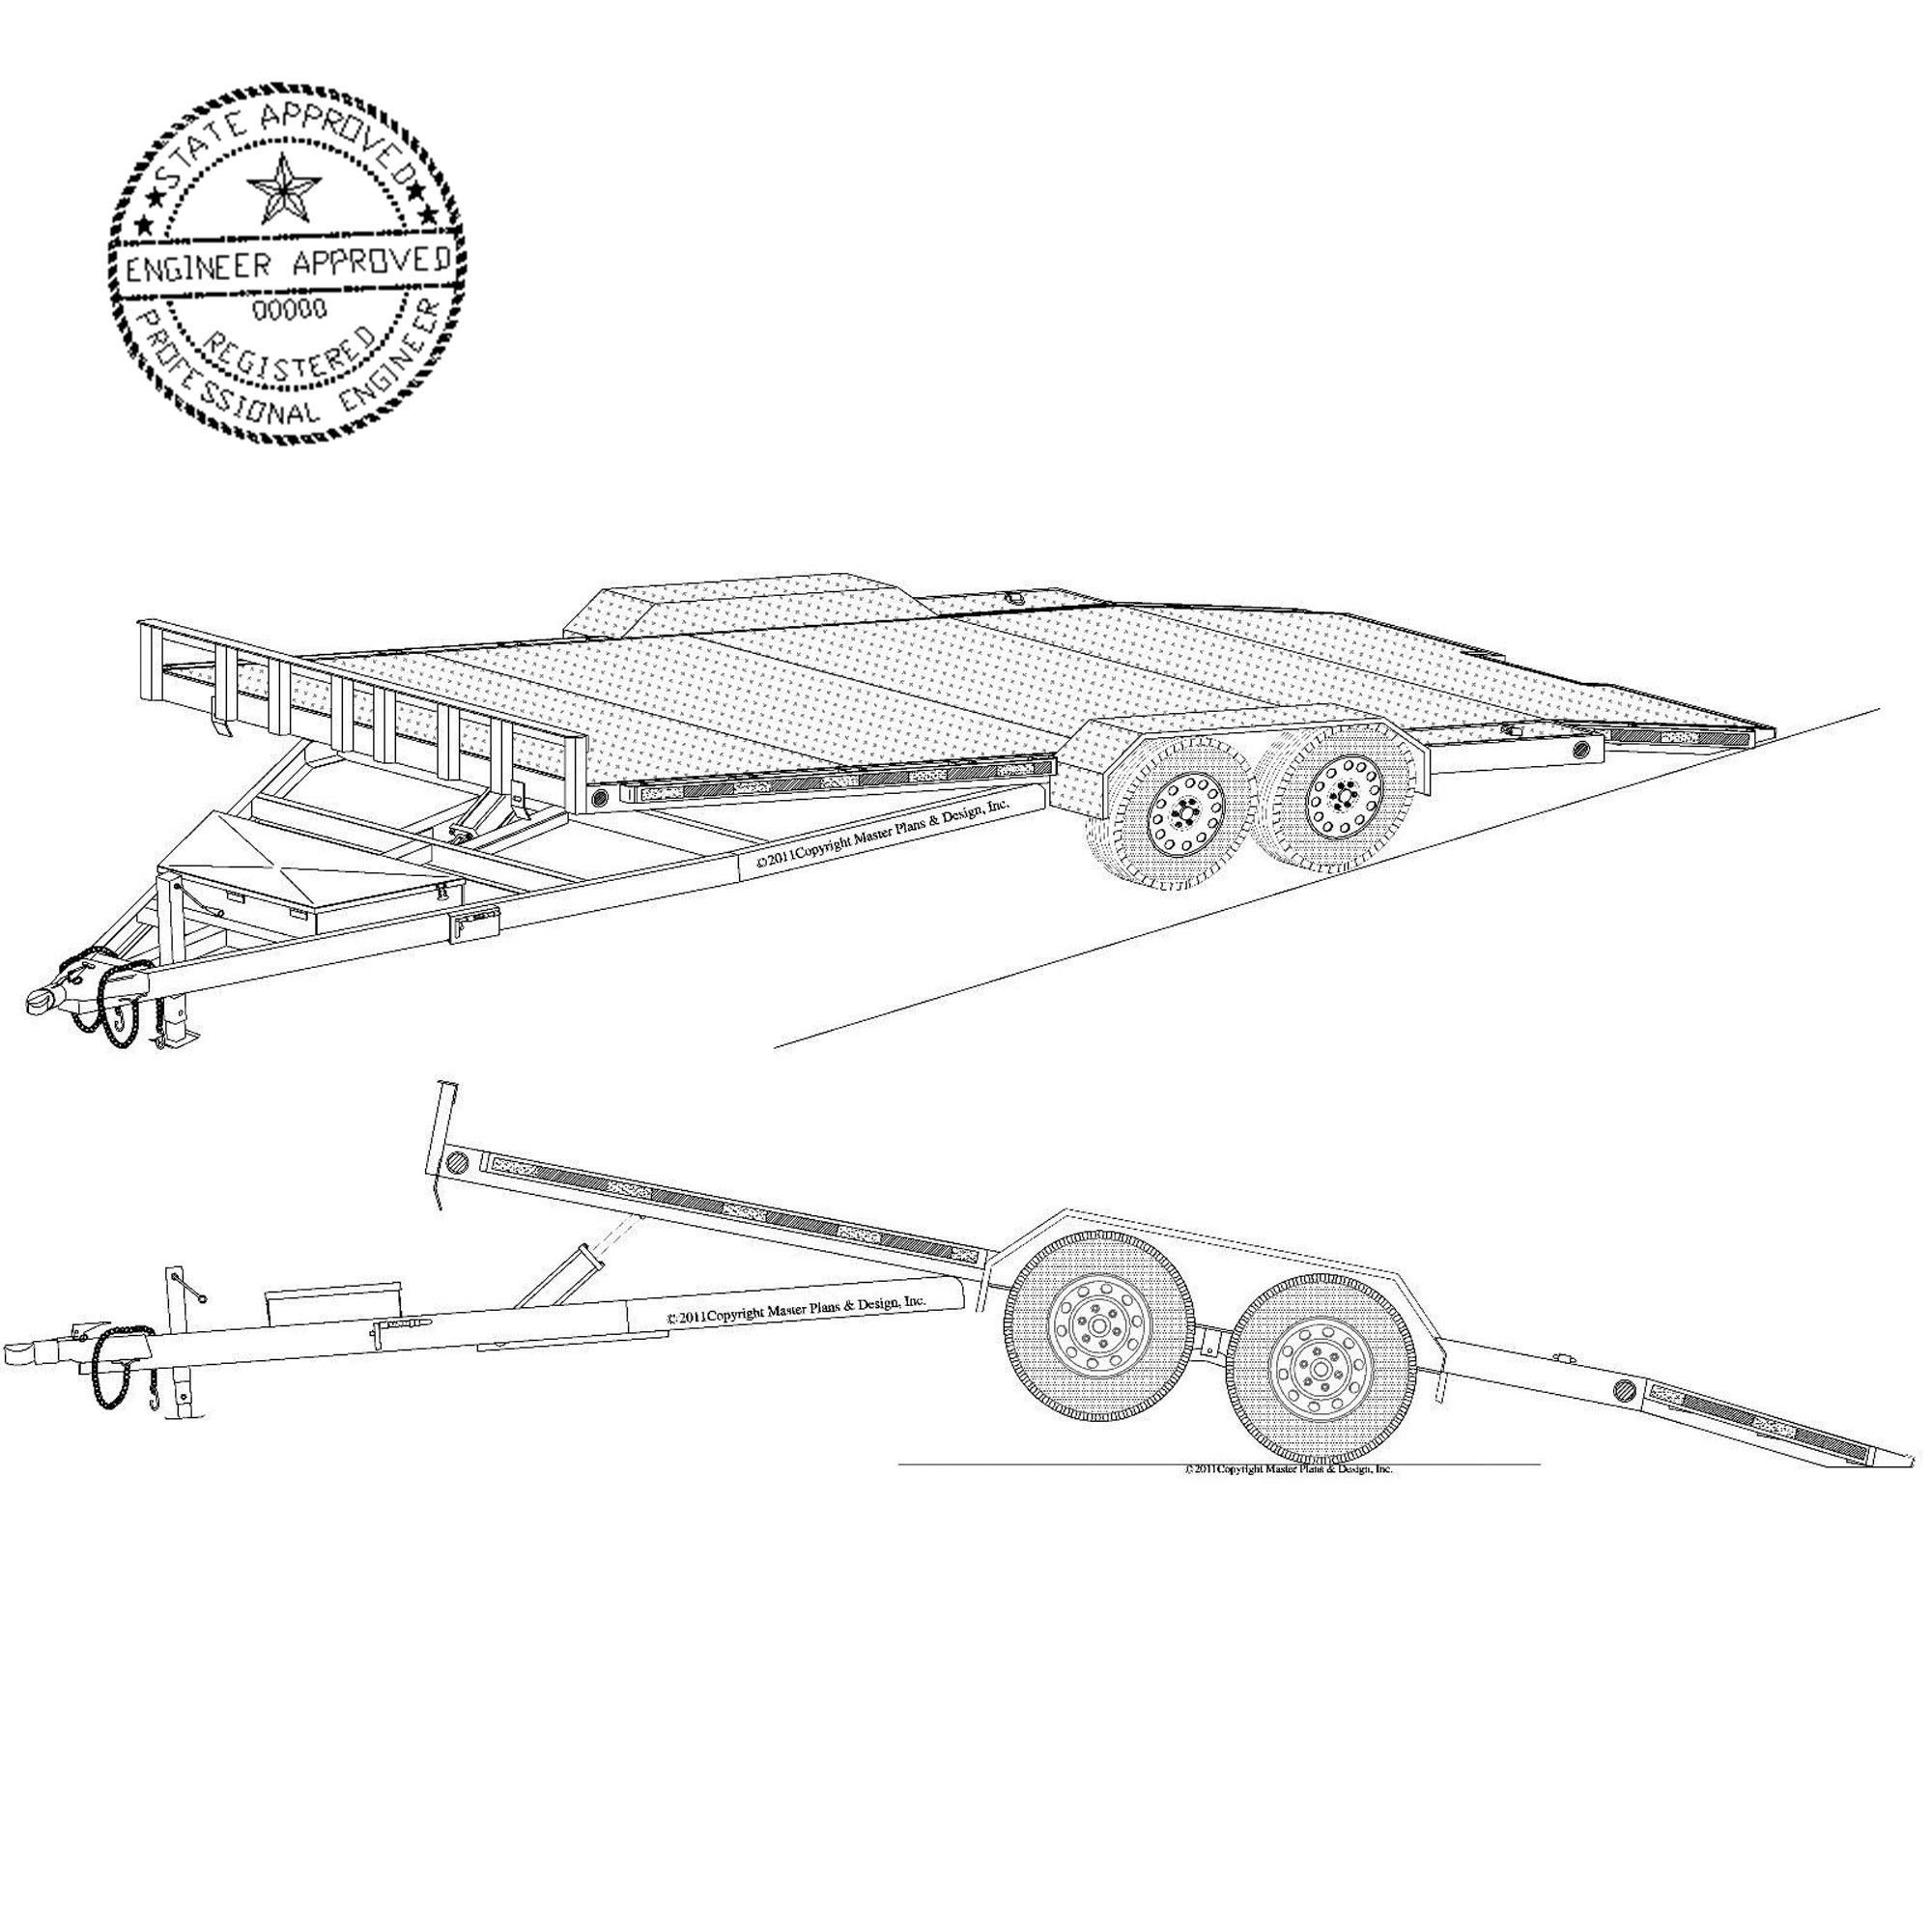 19 x 82 hydraulic car hauler trailer plans blueprints model 19 x 82 hydraulic car hauler trailer plans blueprints model 18ht malvernweather Choice Image